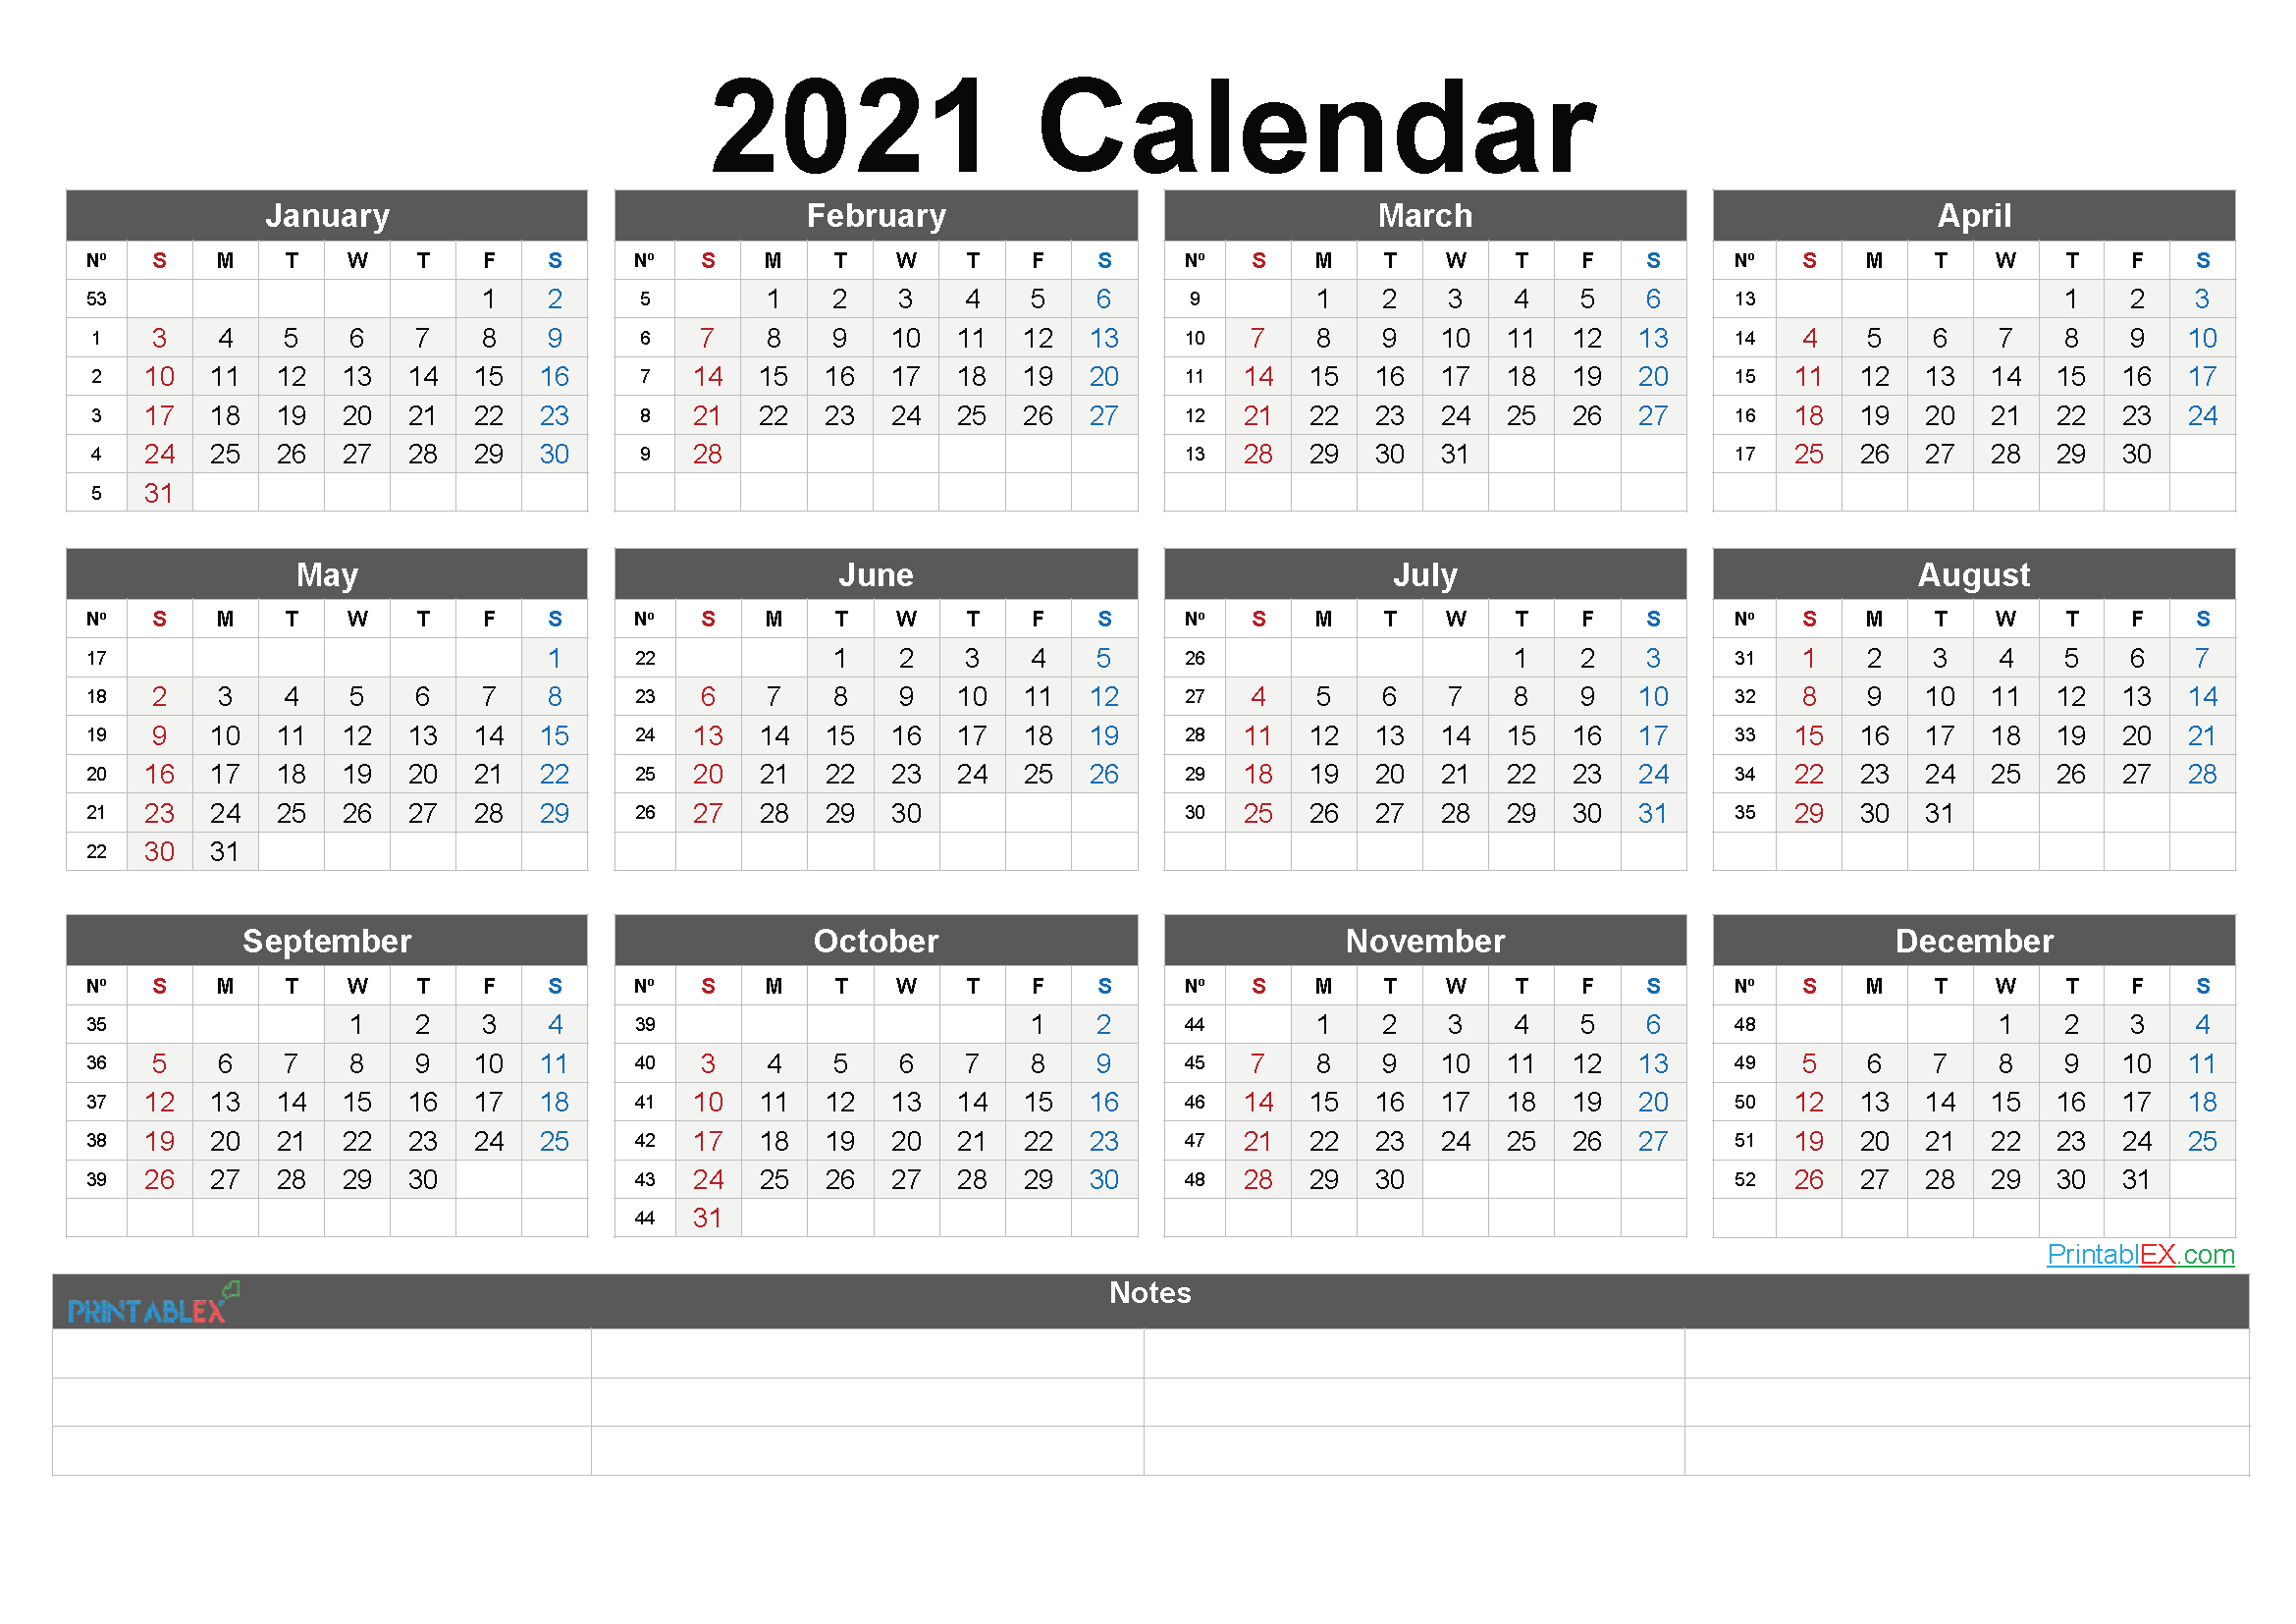 Free Printable 2021 Yearly Calendar With Week Numbers – 6